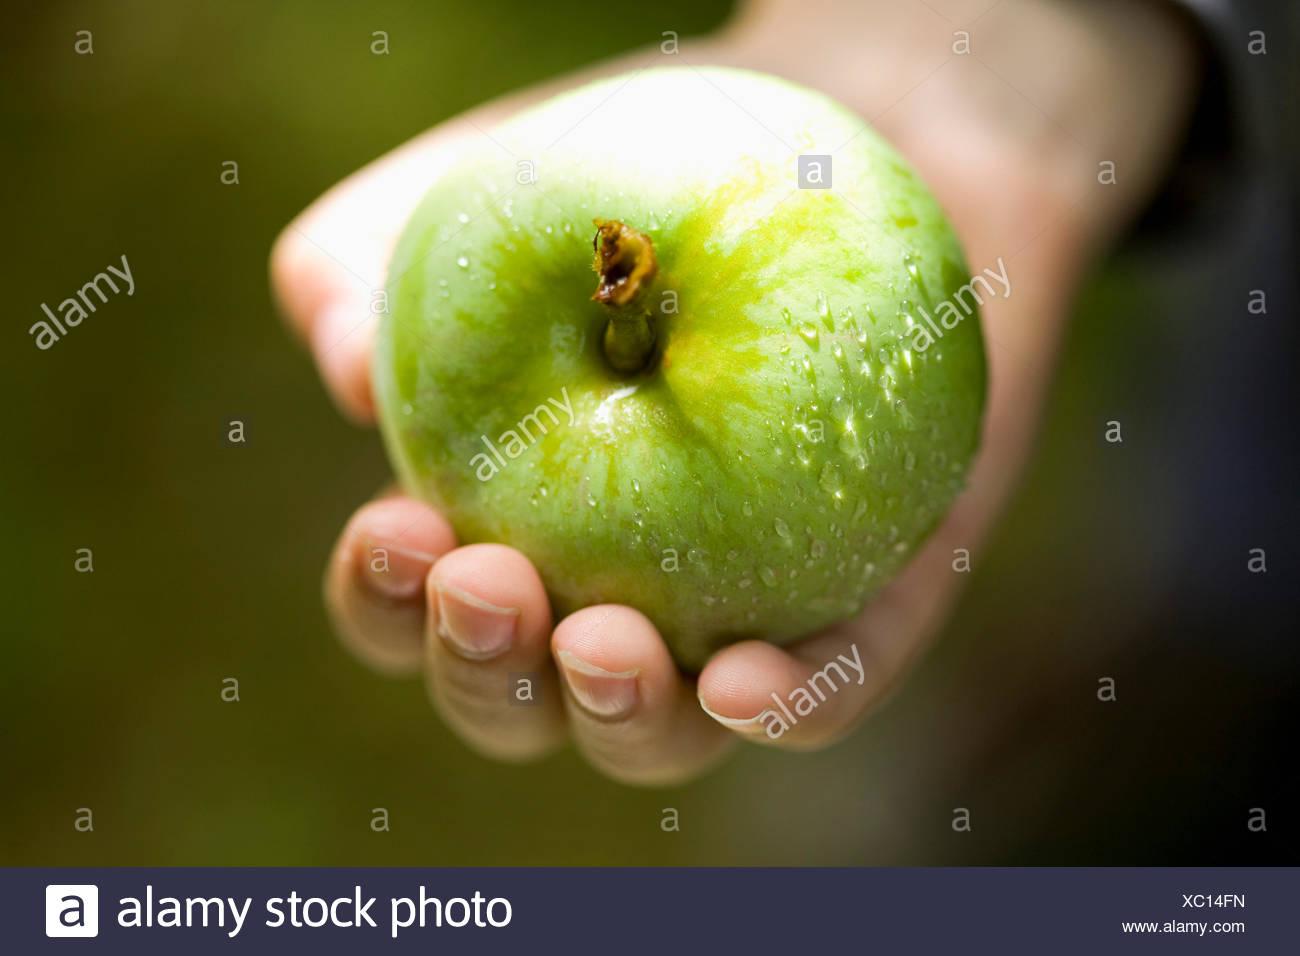 Mano che tiene fresco verde mela Foto Stock